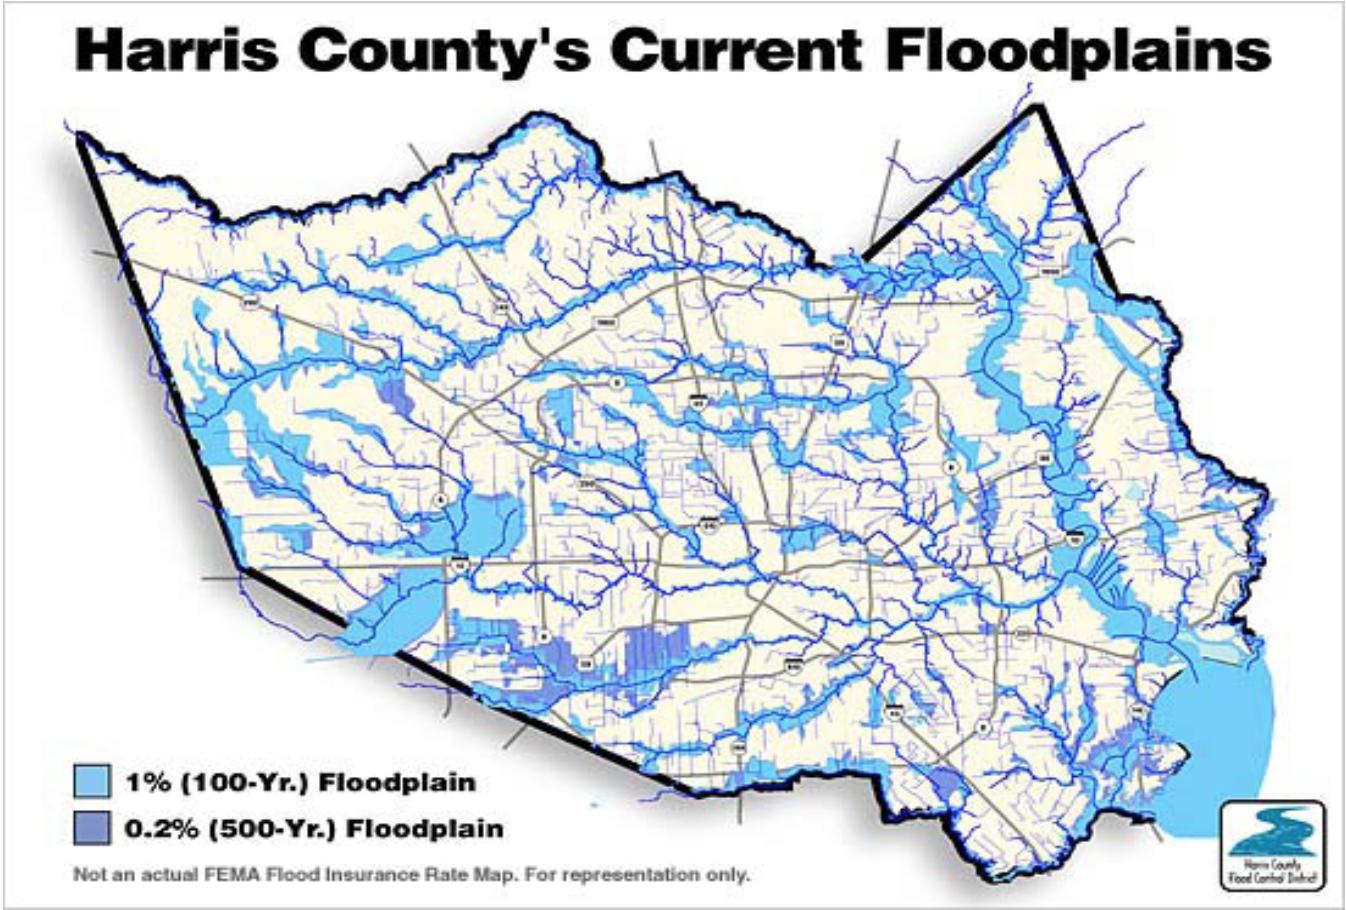 Creative Inspiration Spring Texas Flooding Map Opinion How Houston S - Spring Texas Flooding Map